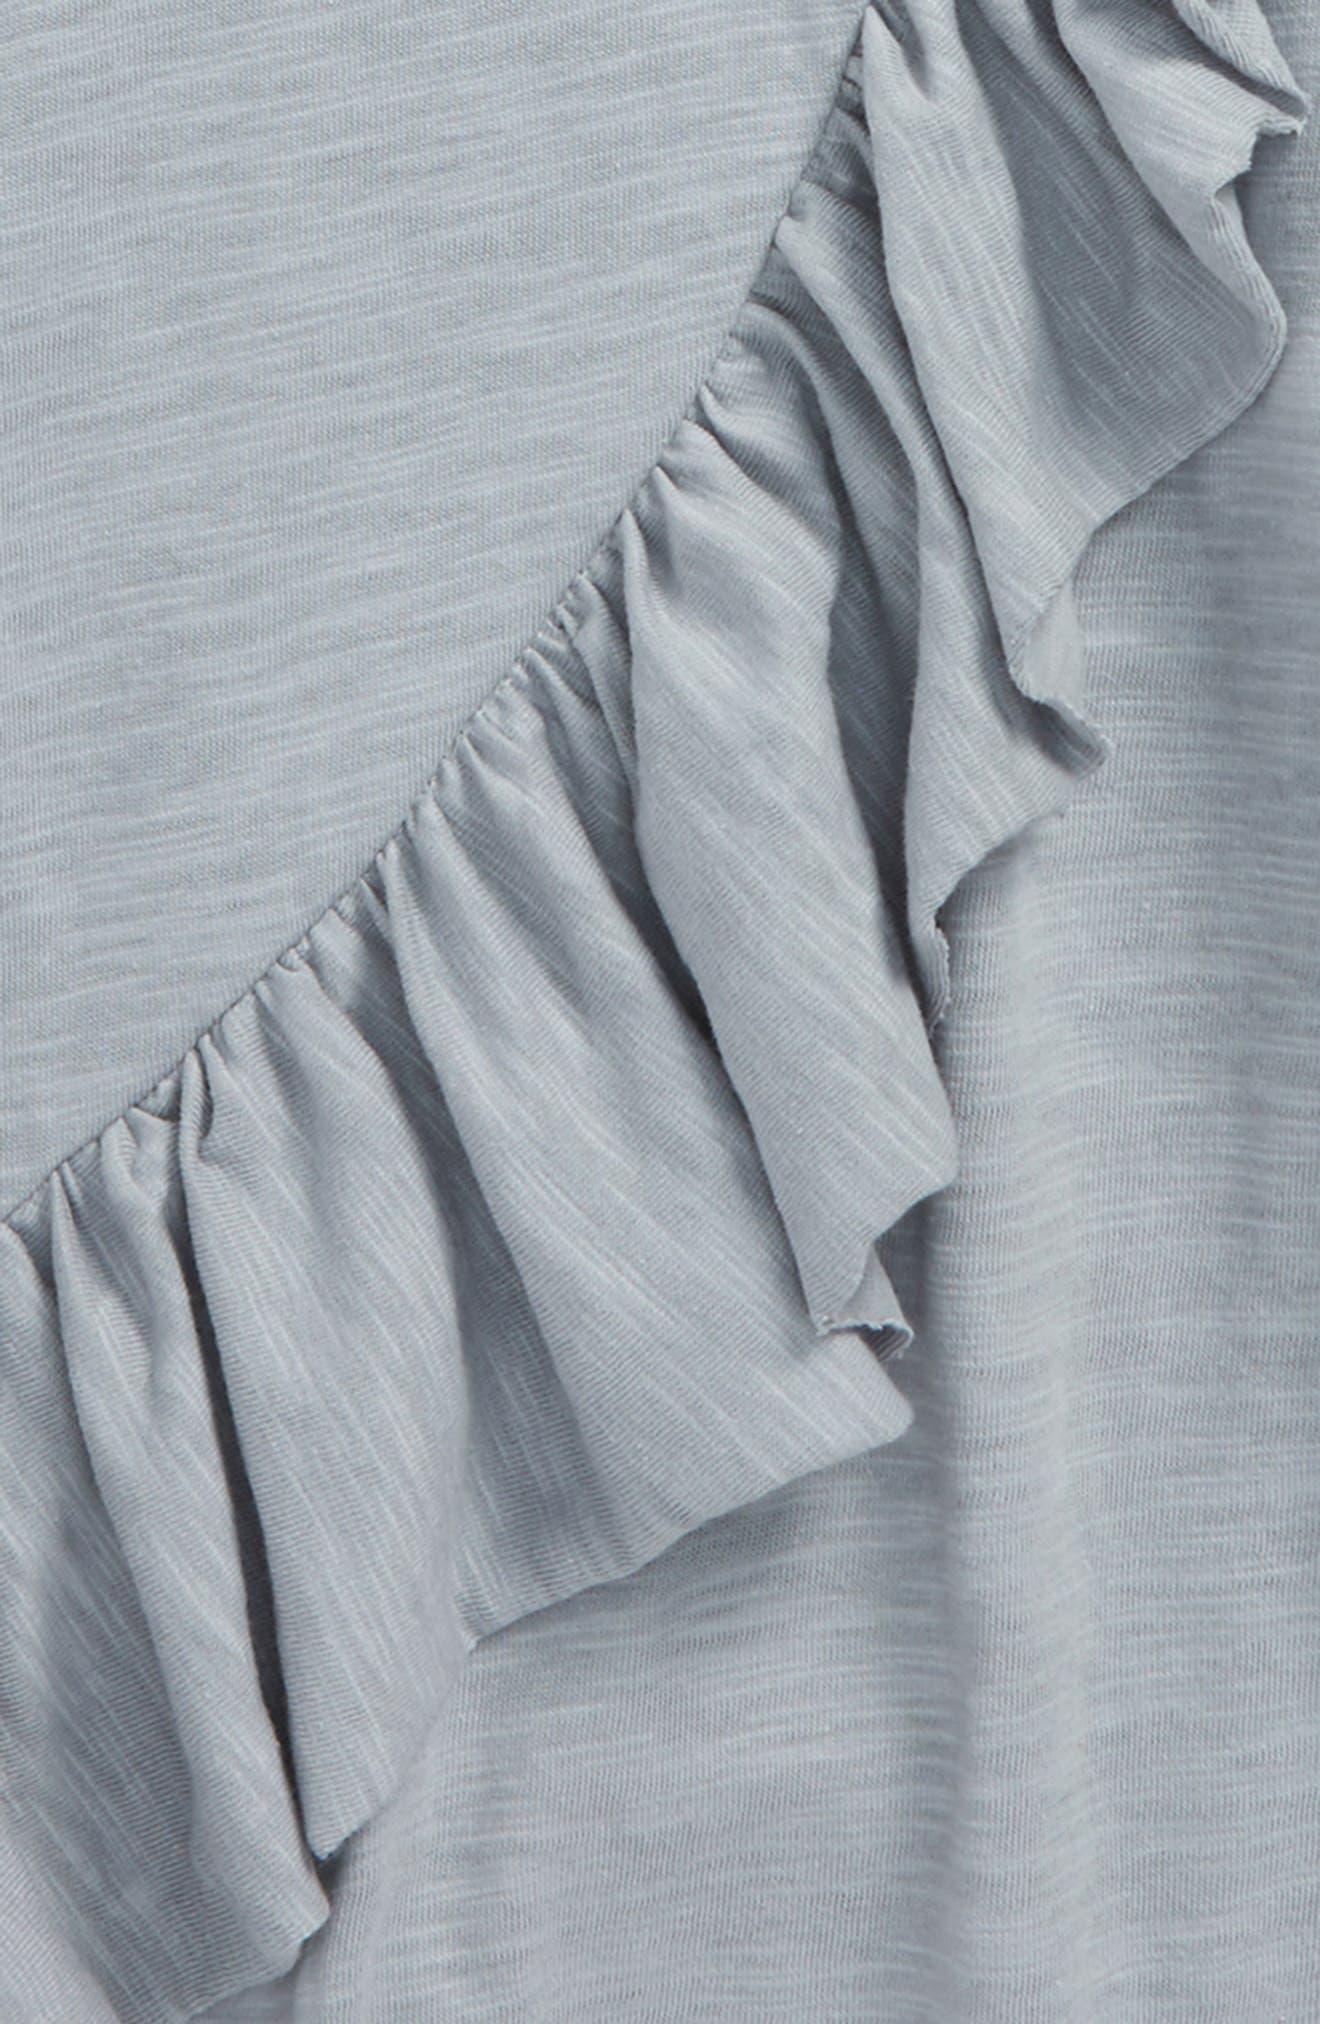 Silverlake Asymmetrical Ruffle Top,                             Alternate thumbnail 2, color,                             450